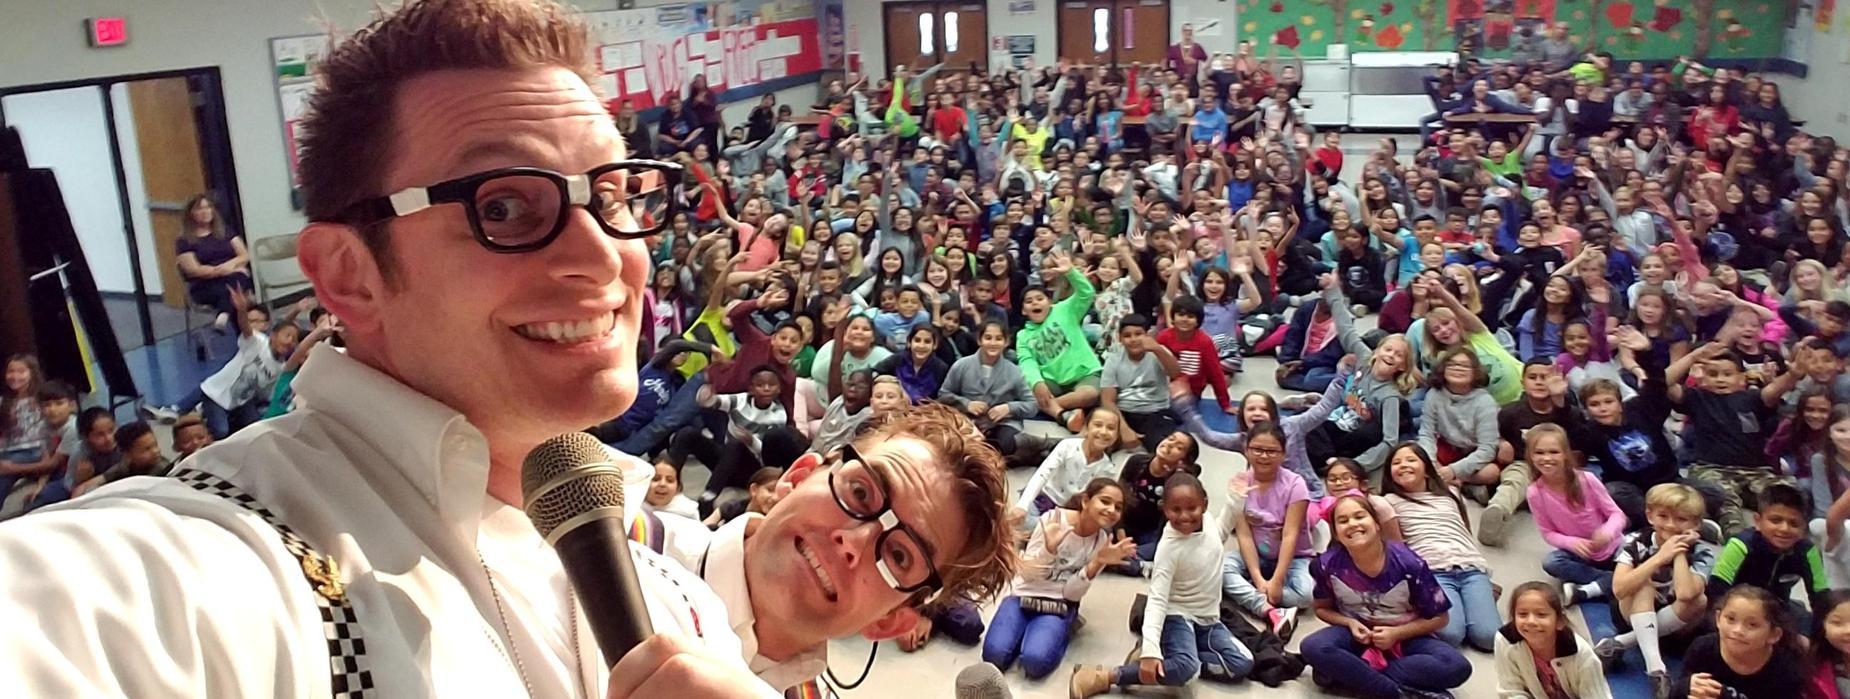 River Bluff Elementary